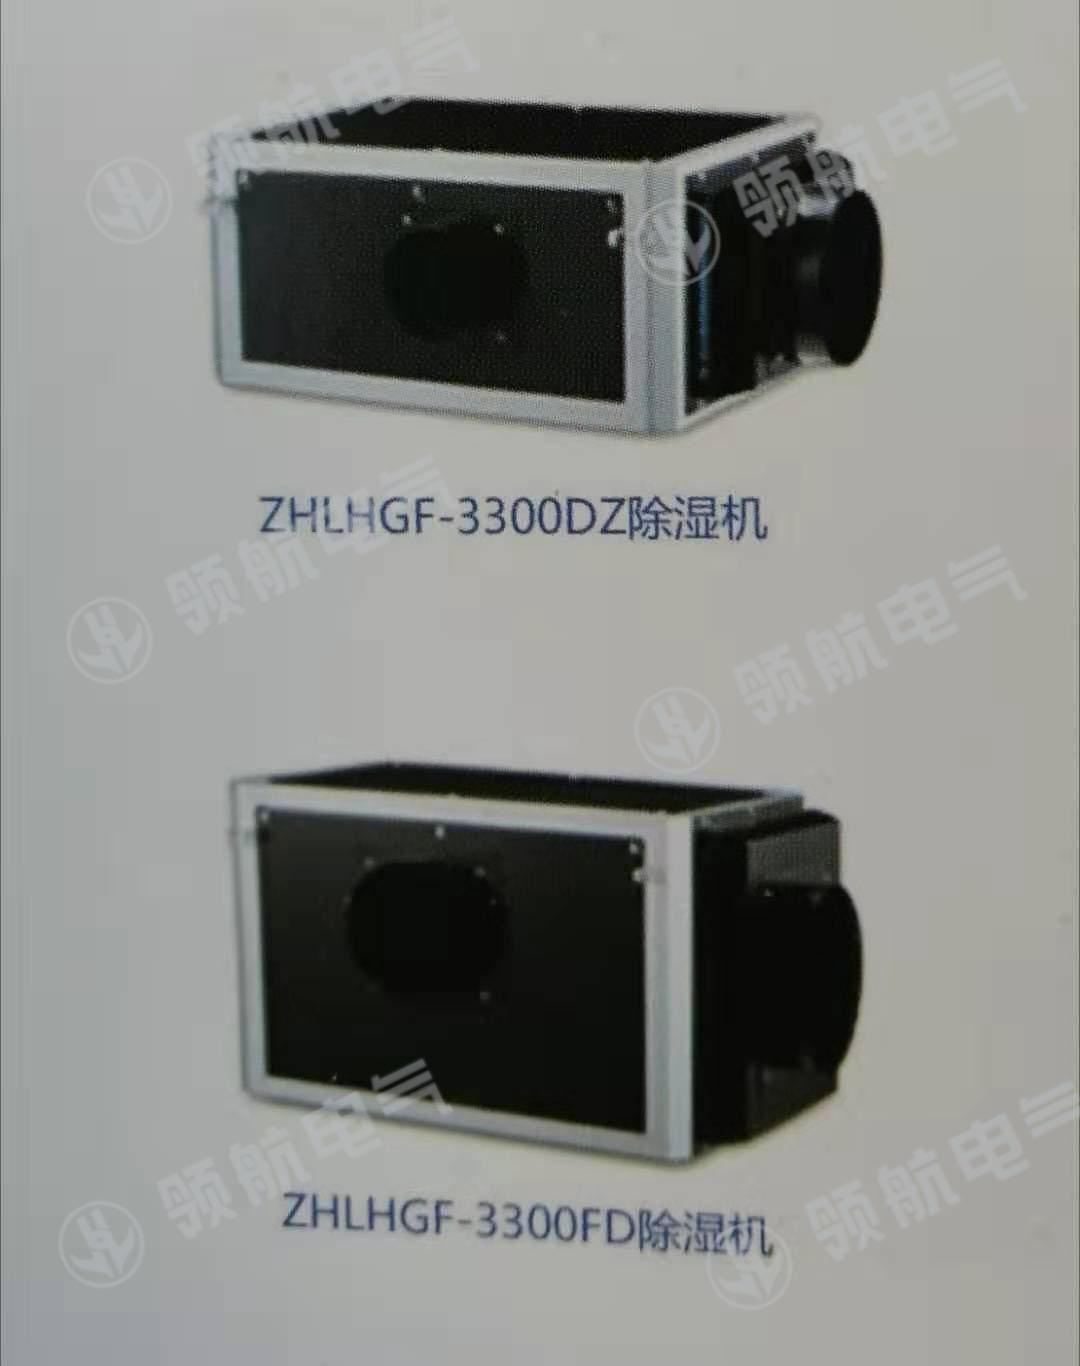 ZHLHGF-3300DZ/FD除湿机